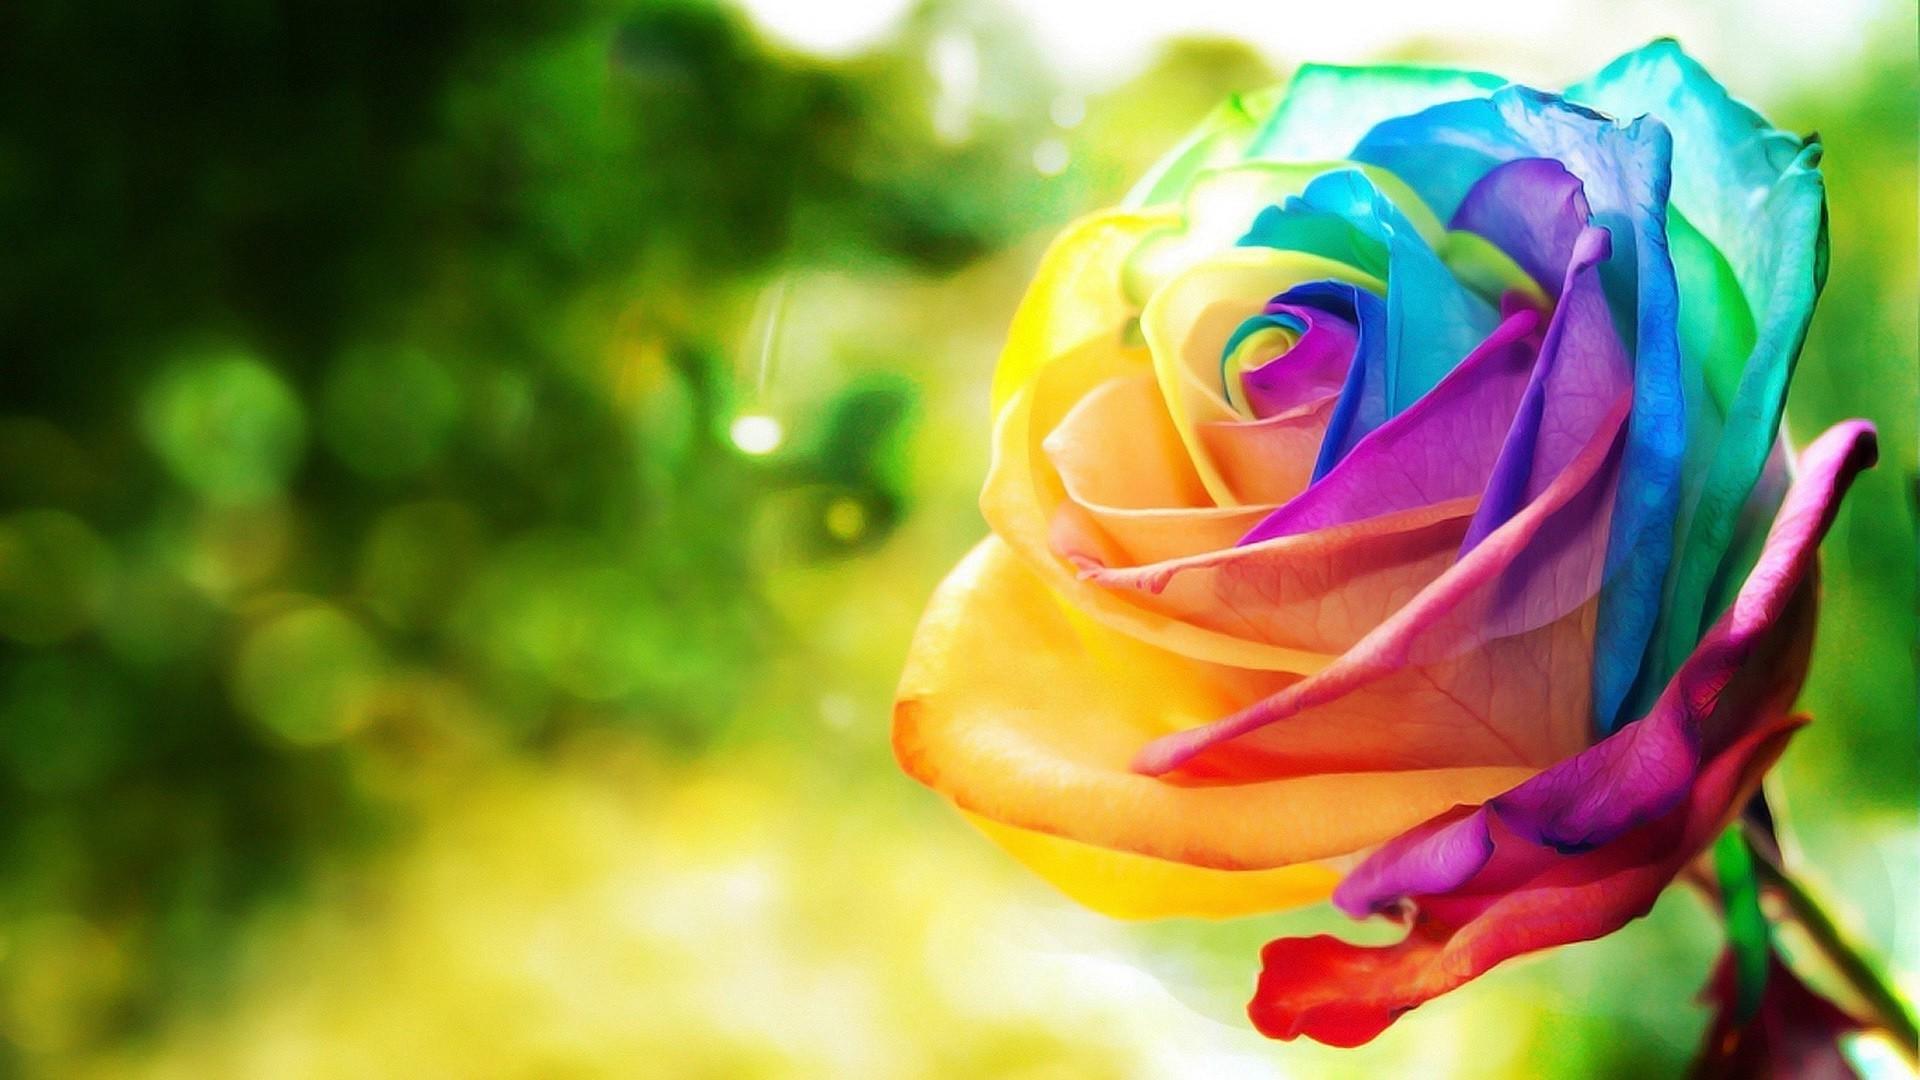 Rainbow Rose PC Wallpaper